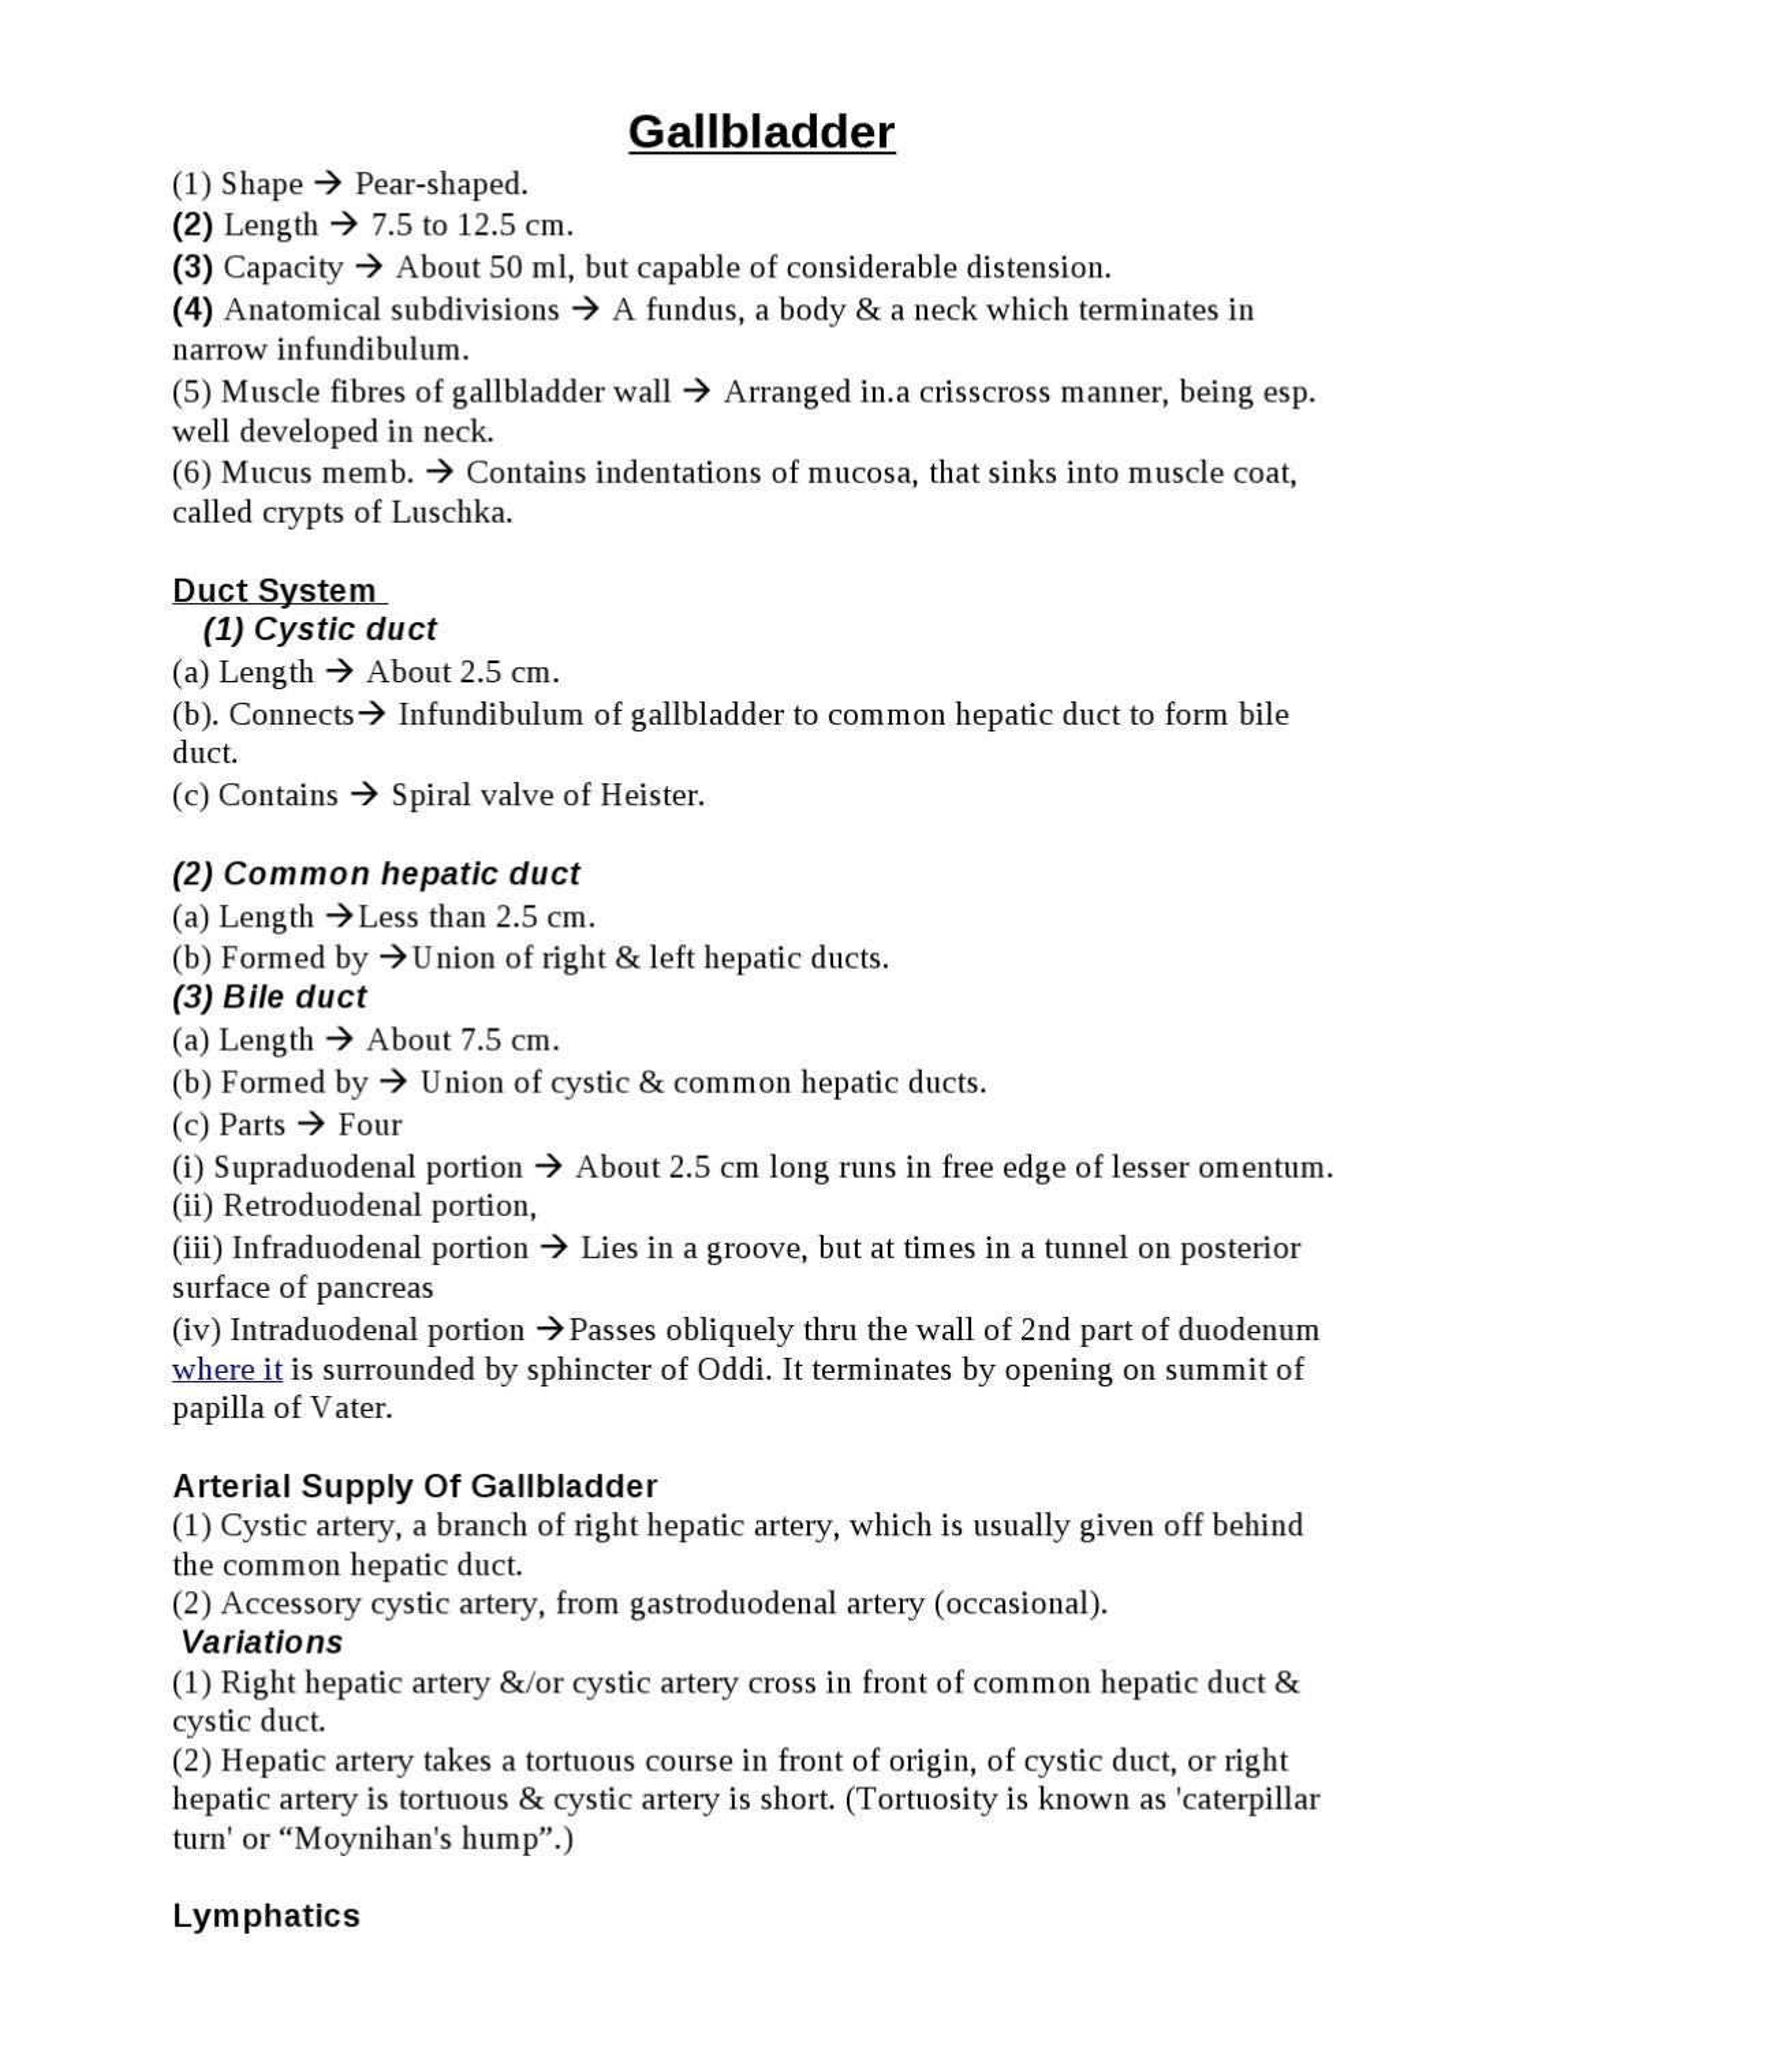 Gallbladder by kuboja reuben nyaruga - issuu